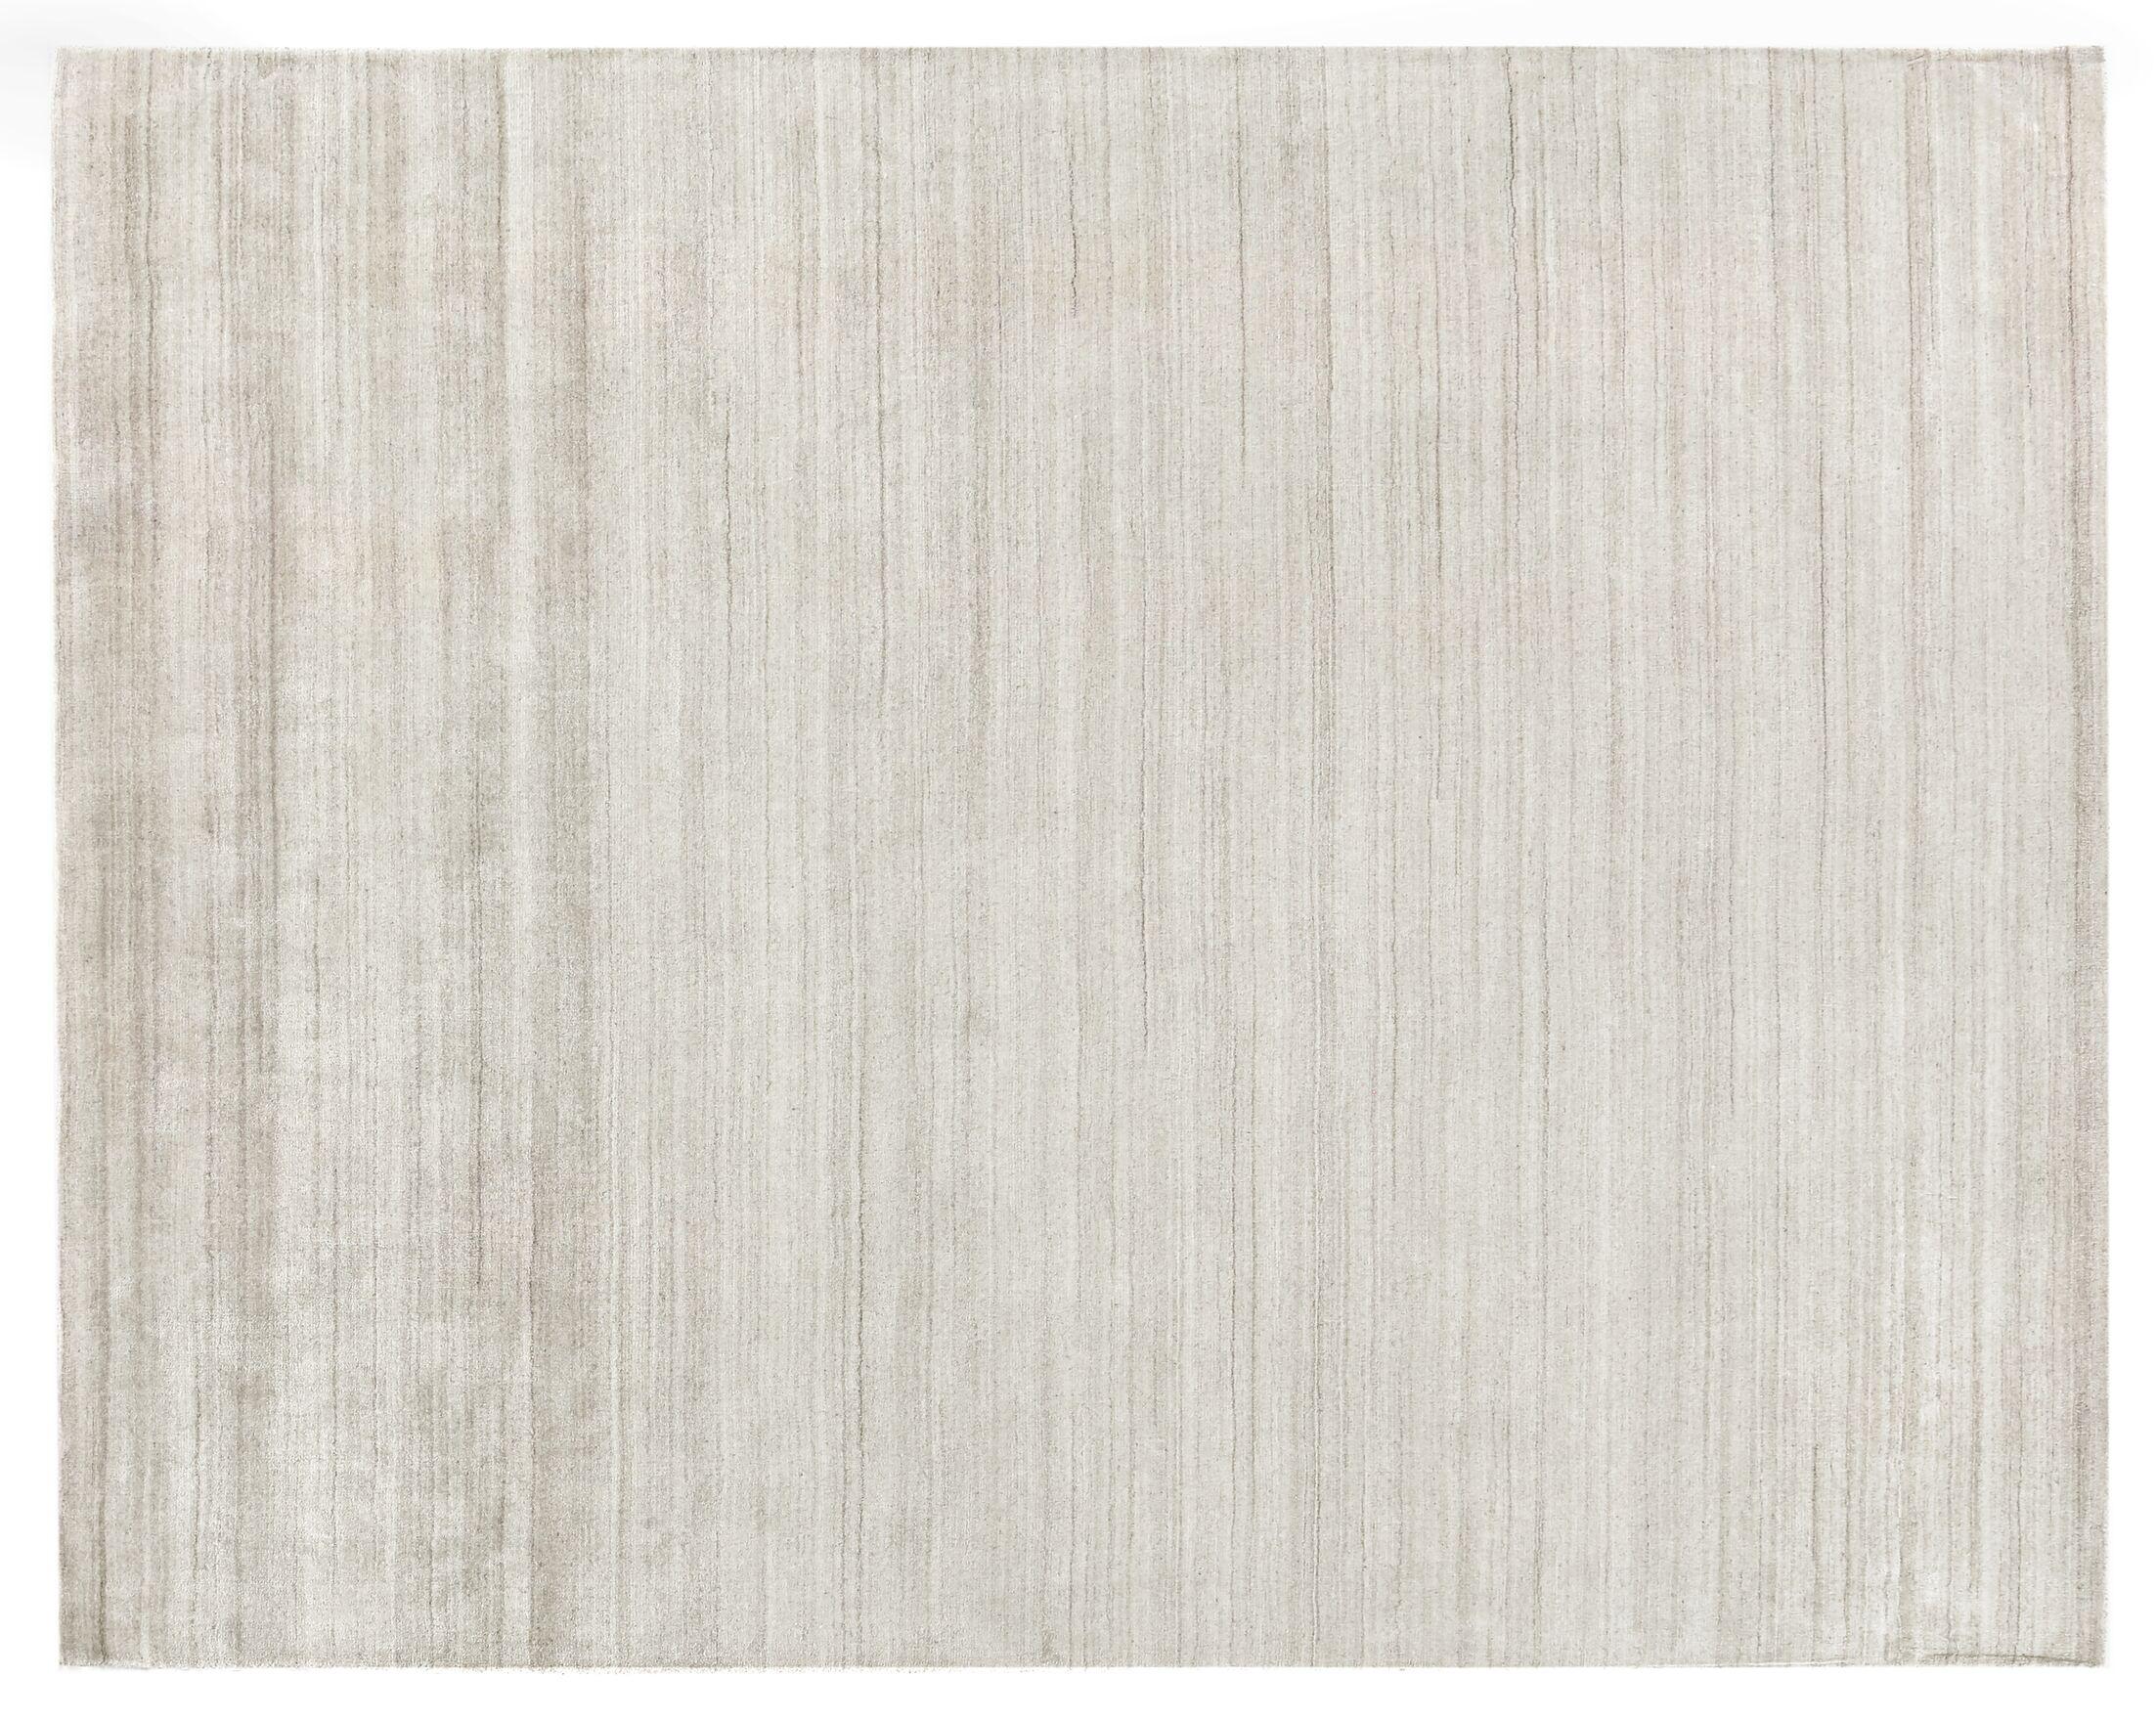 Sanctuary Hand Woven Silk Beige Area Rug Rug Size: Rectangle 9' x 12'